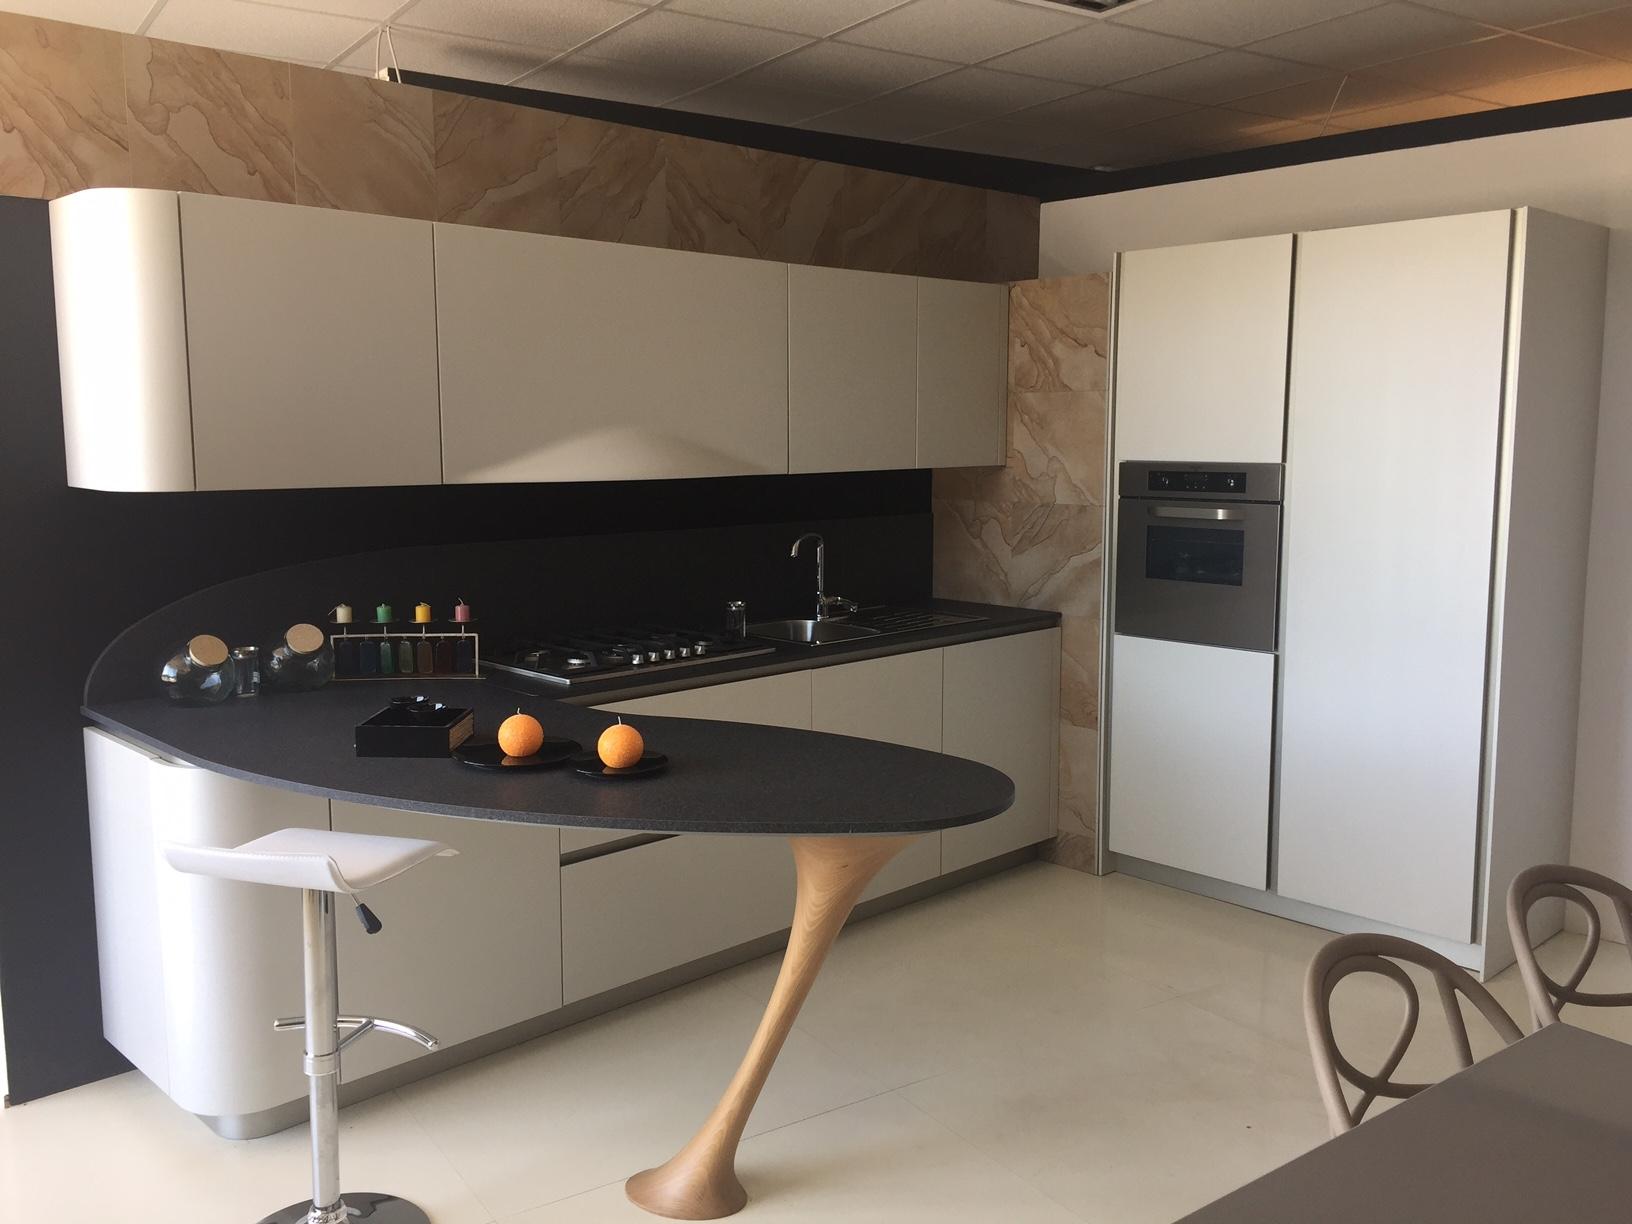 Snaidero cucina ola 20 moderne laccate opaco cucine a - Colonne bagno mondo convenienza ...